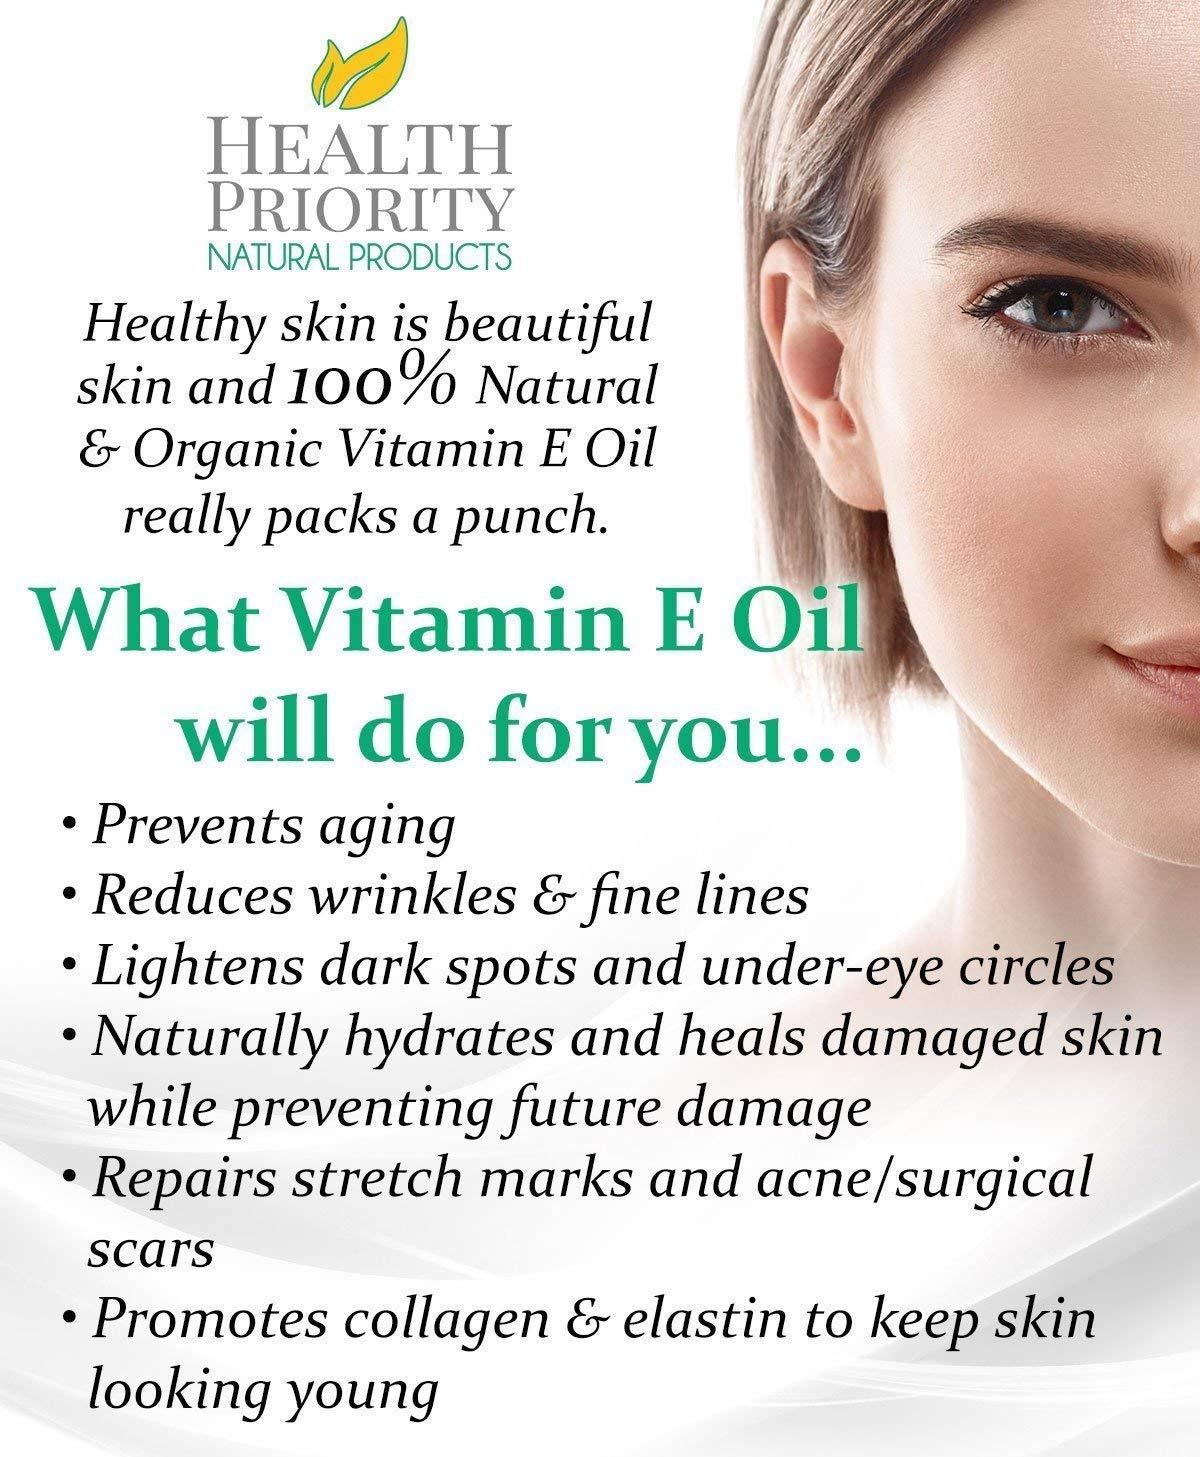 100% All Natural & Organic Vitamin E Oil For Your Face & Skin -  15,000/30,000 IU -